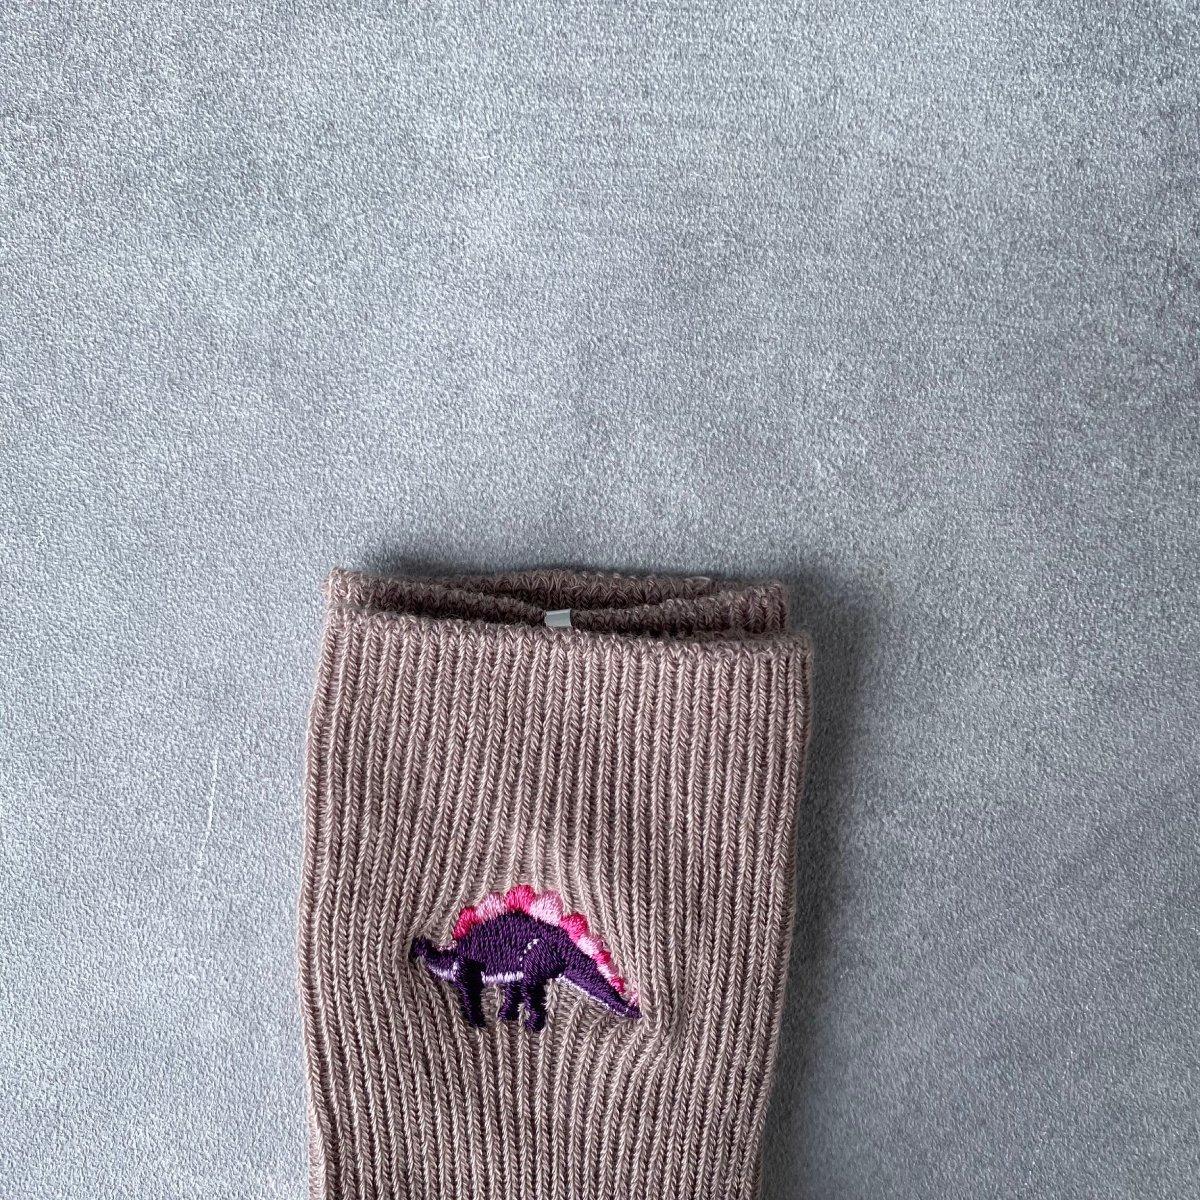 【KIDS】Dino Socks 詳細画像4